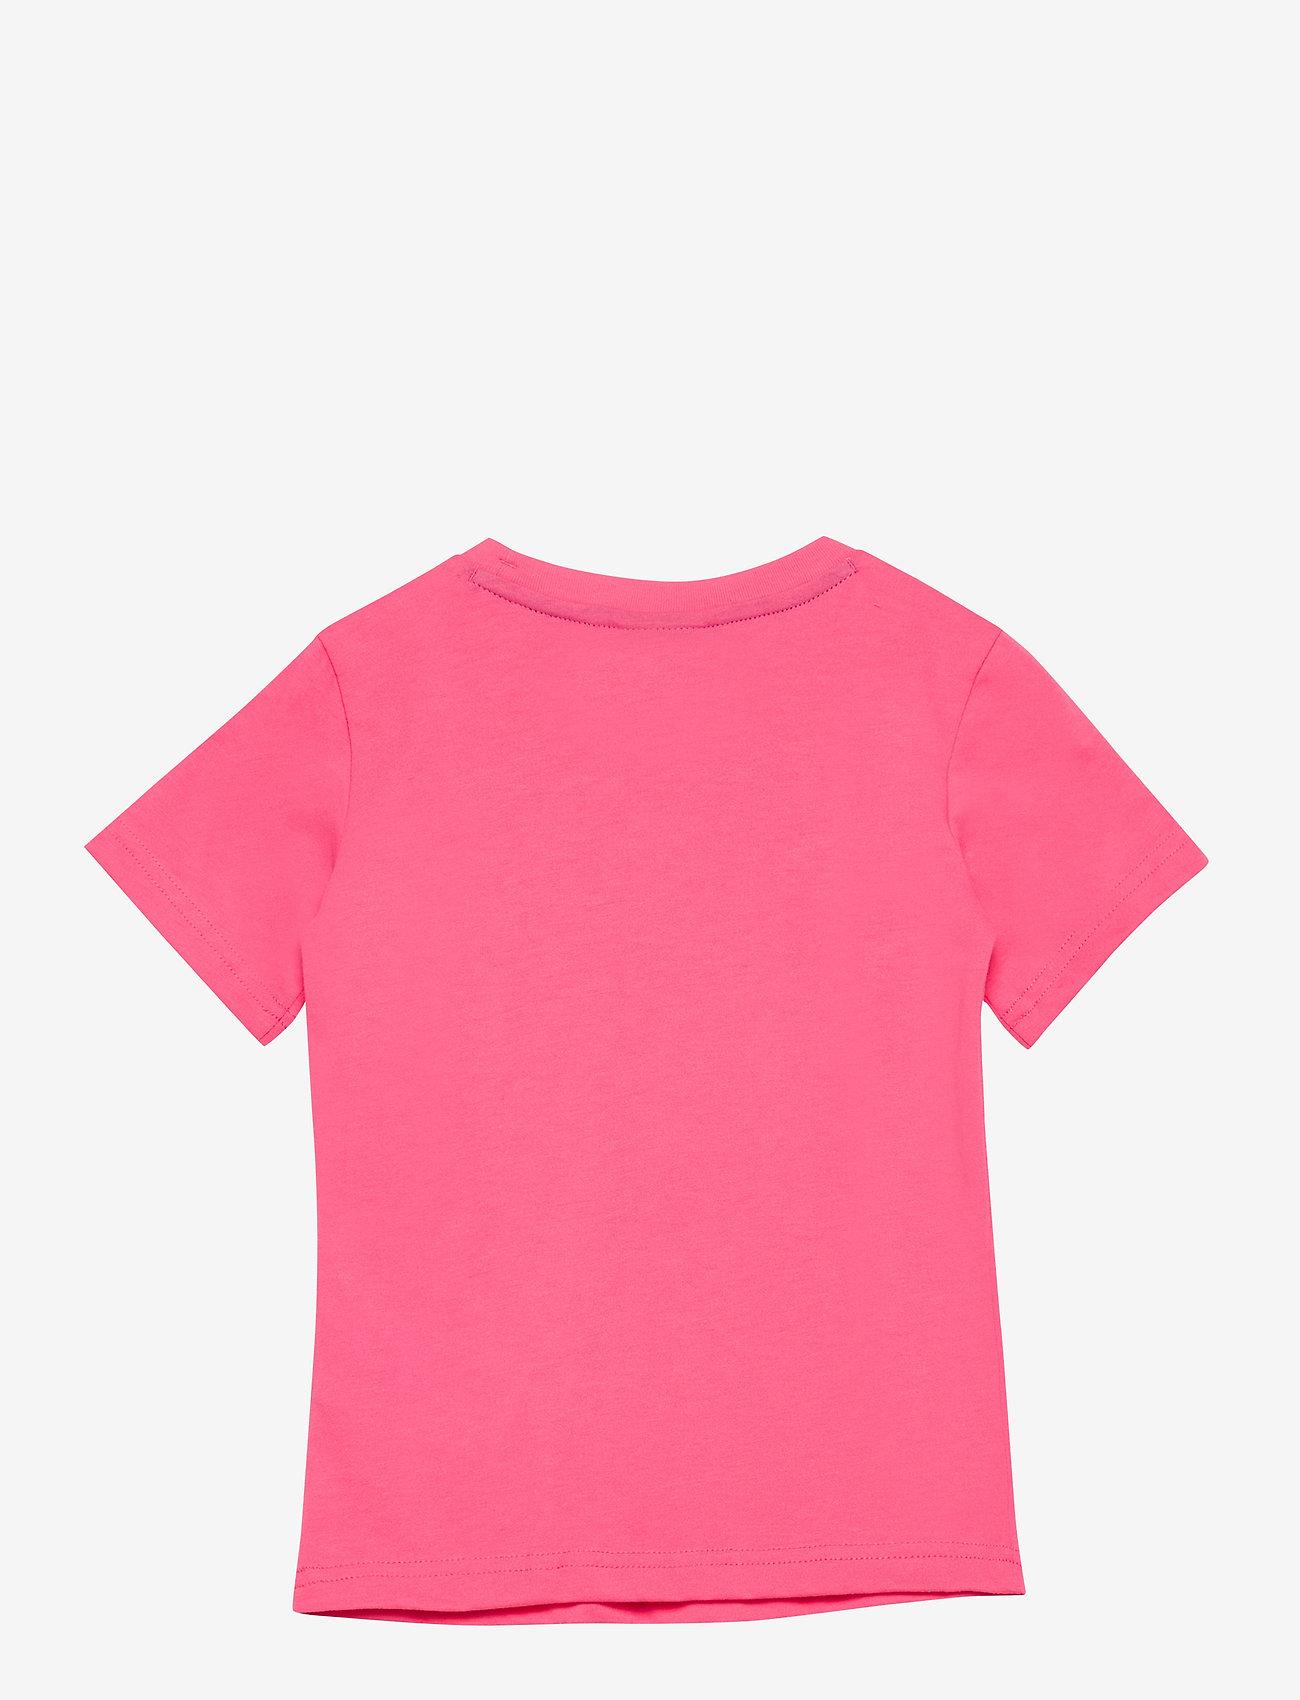 Crewneck T-shirt (Knochout Pink Fluo) (10.80 €) - Champion HUvYr